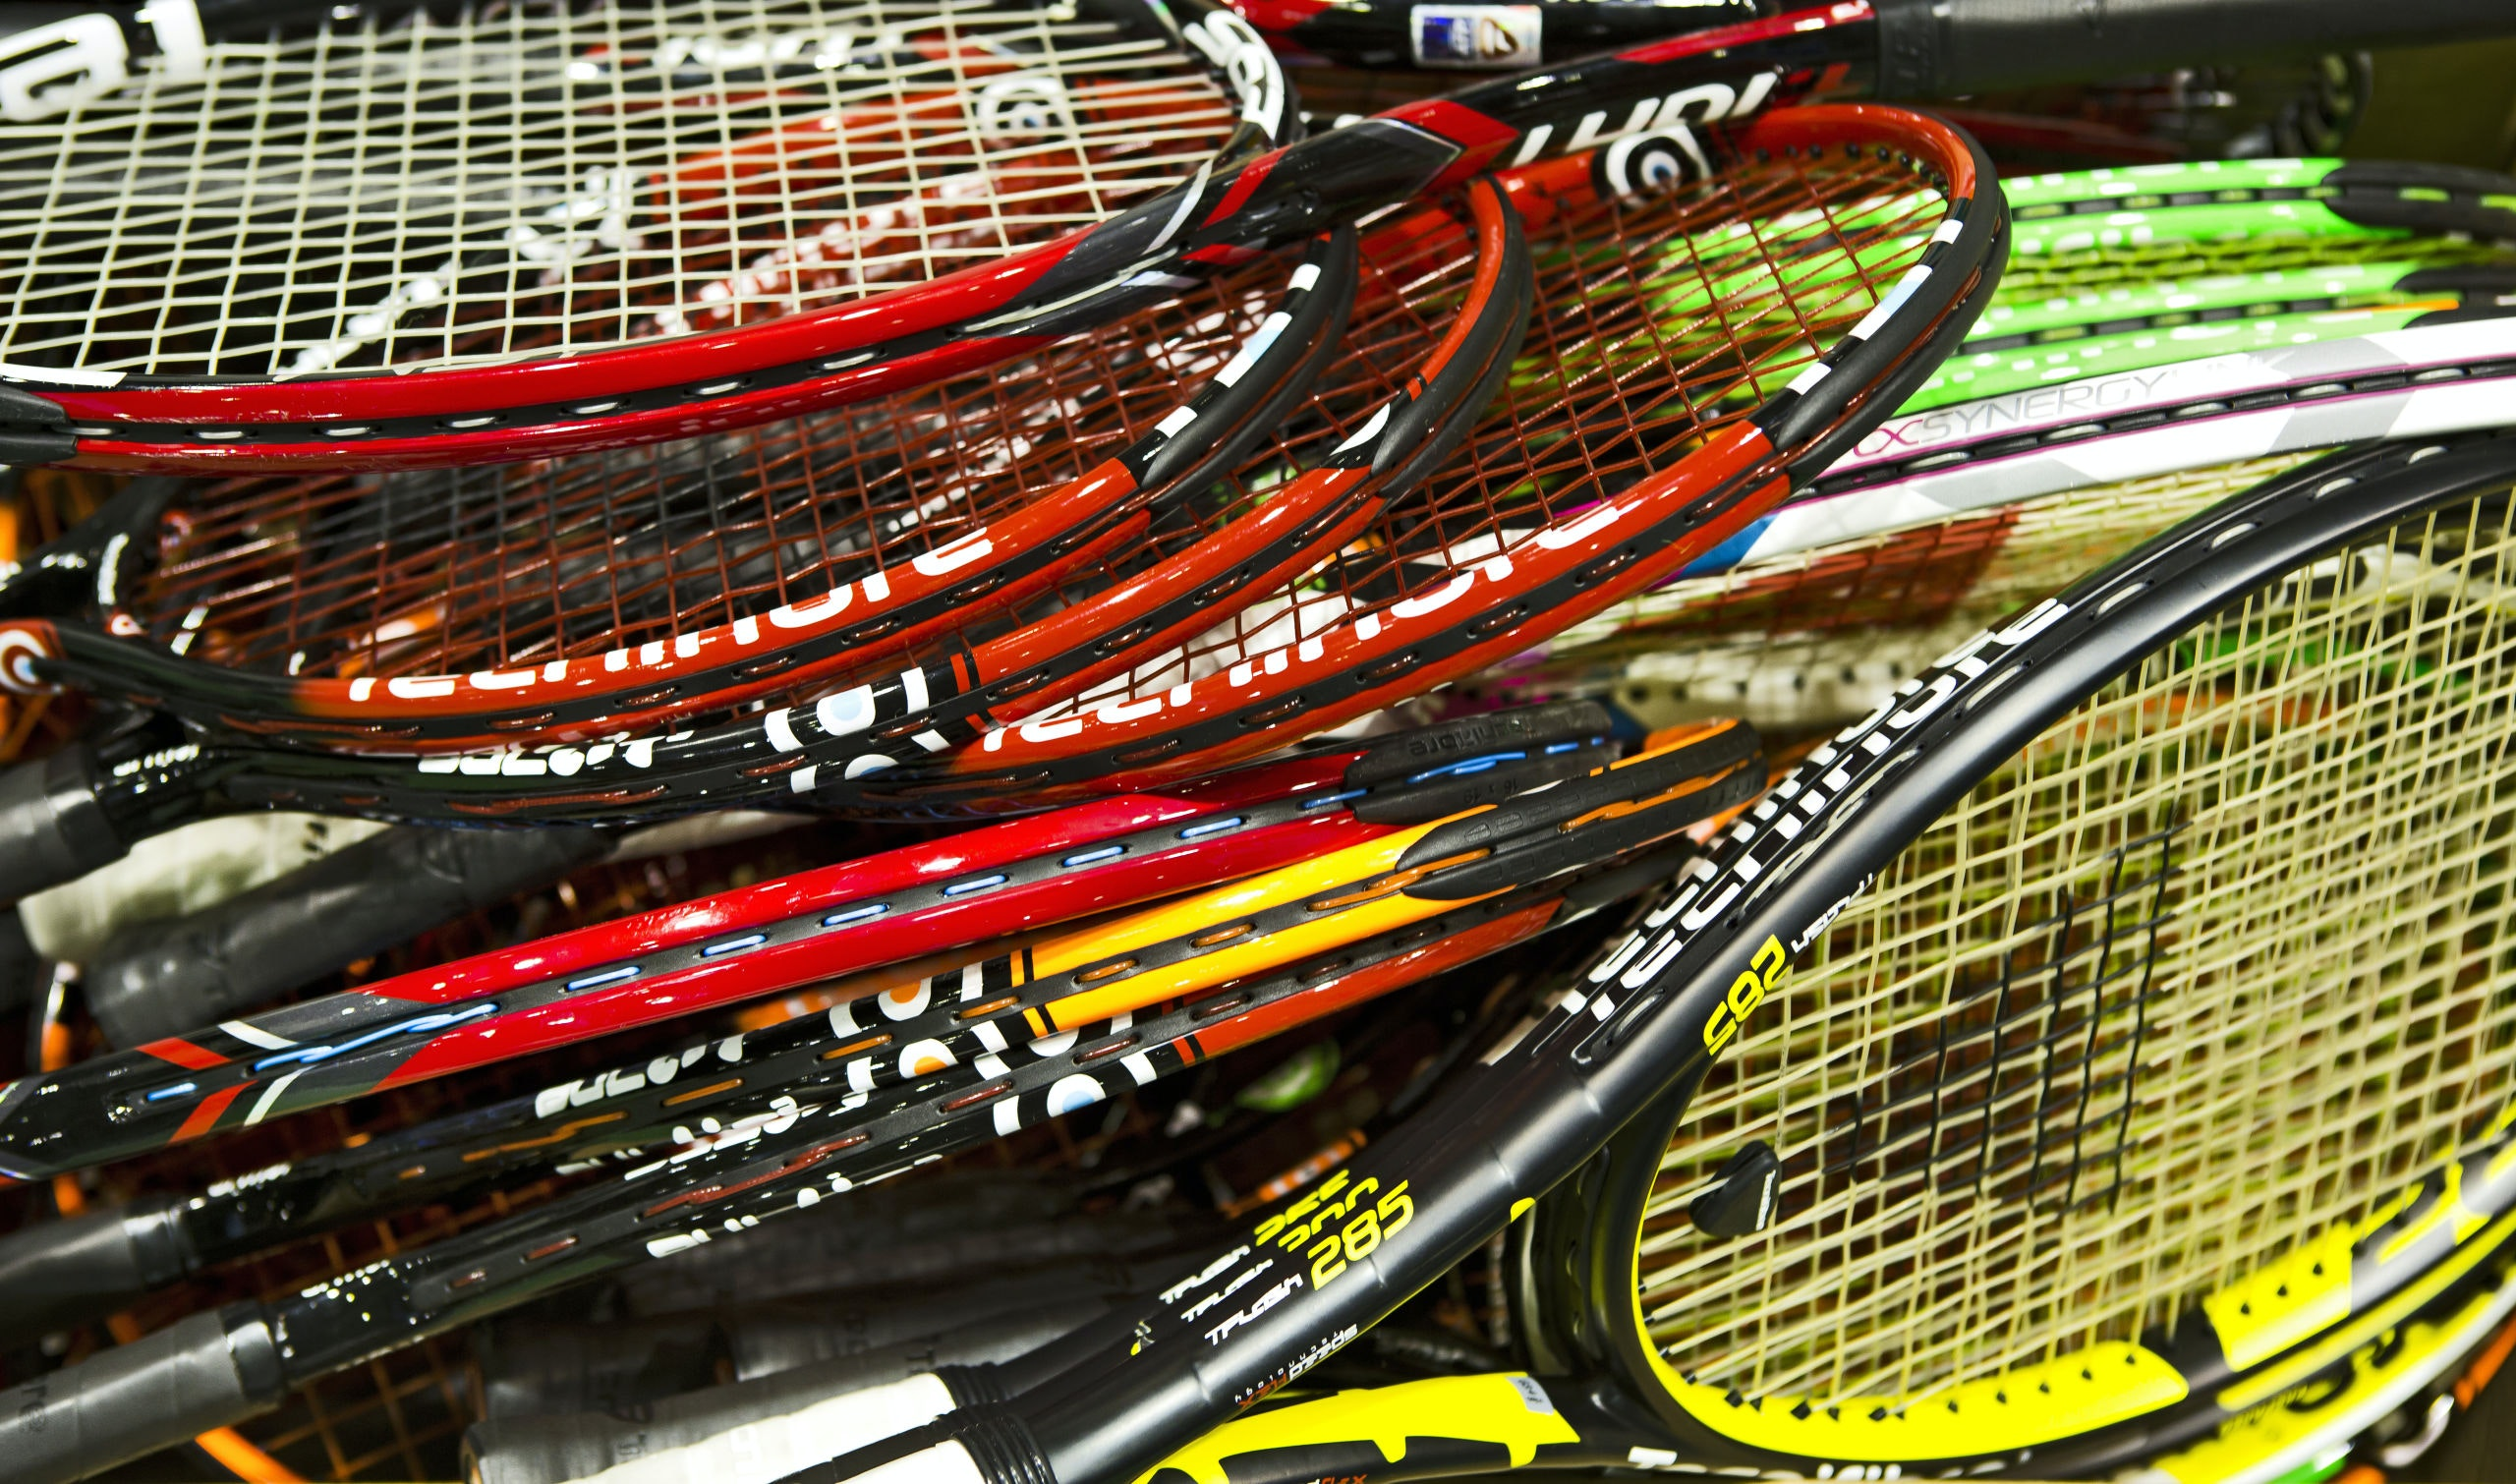 de man die de tennisrackets spant bnr nieuwsradioTennisrackets #18